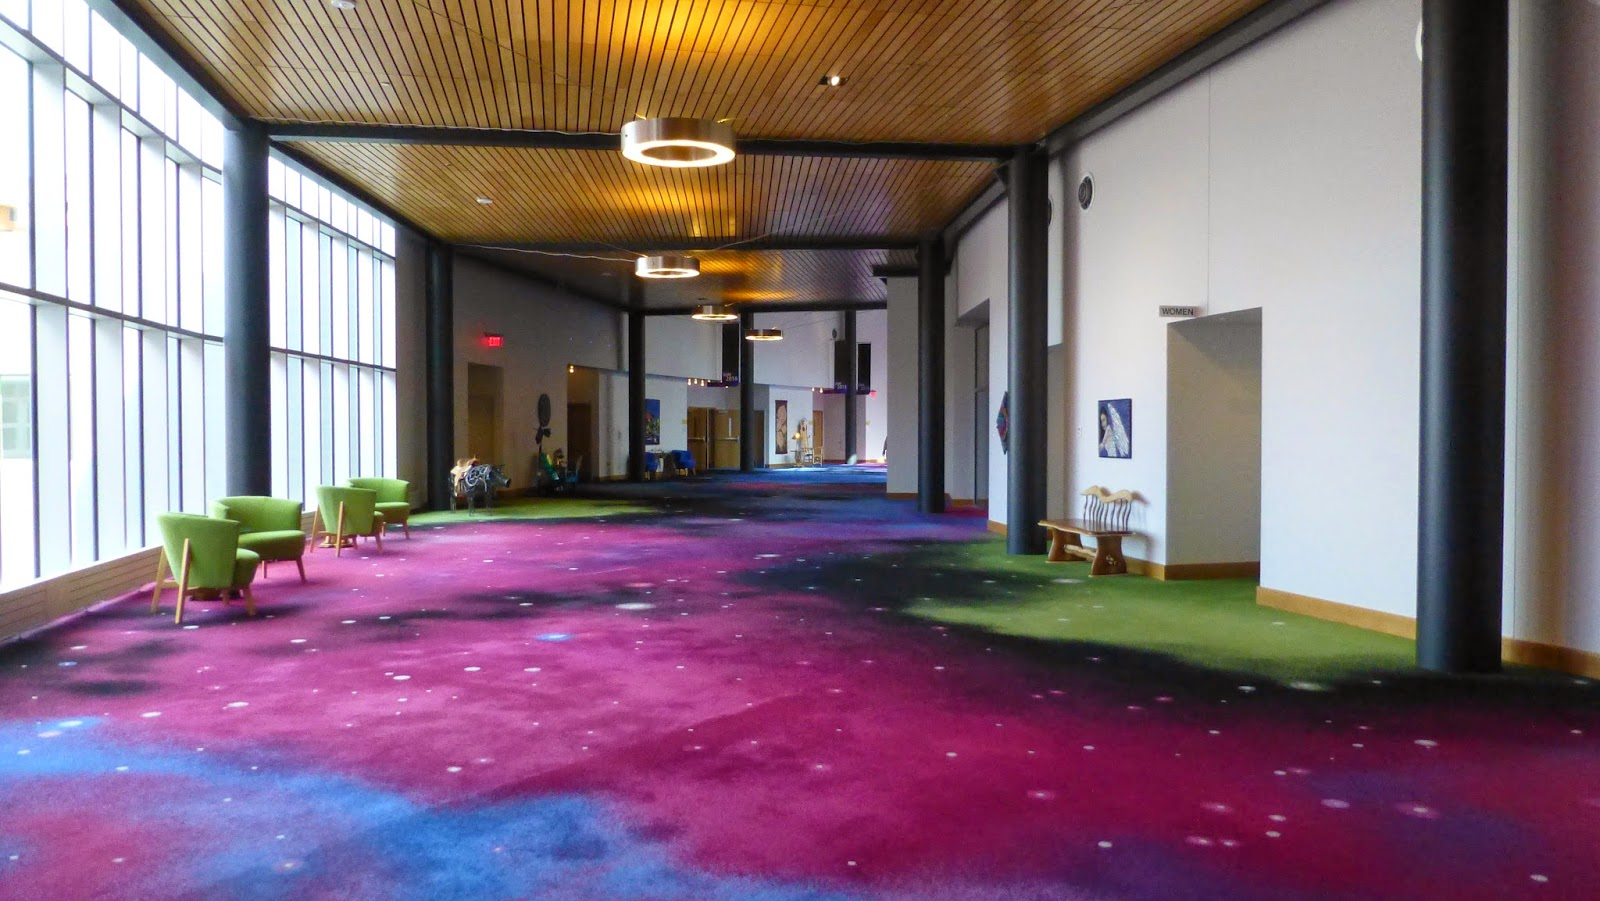 Epic Madison Wi >> Kim's Blog: Epic training facility in Verona, Wisconsin